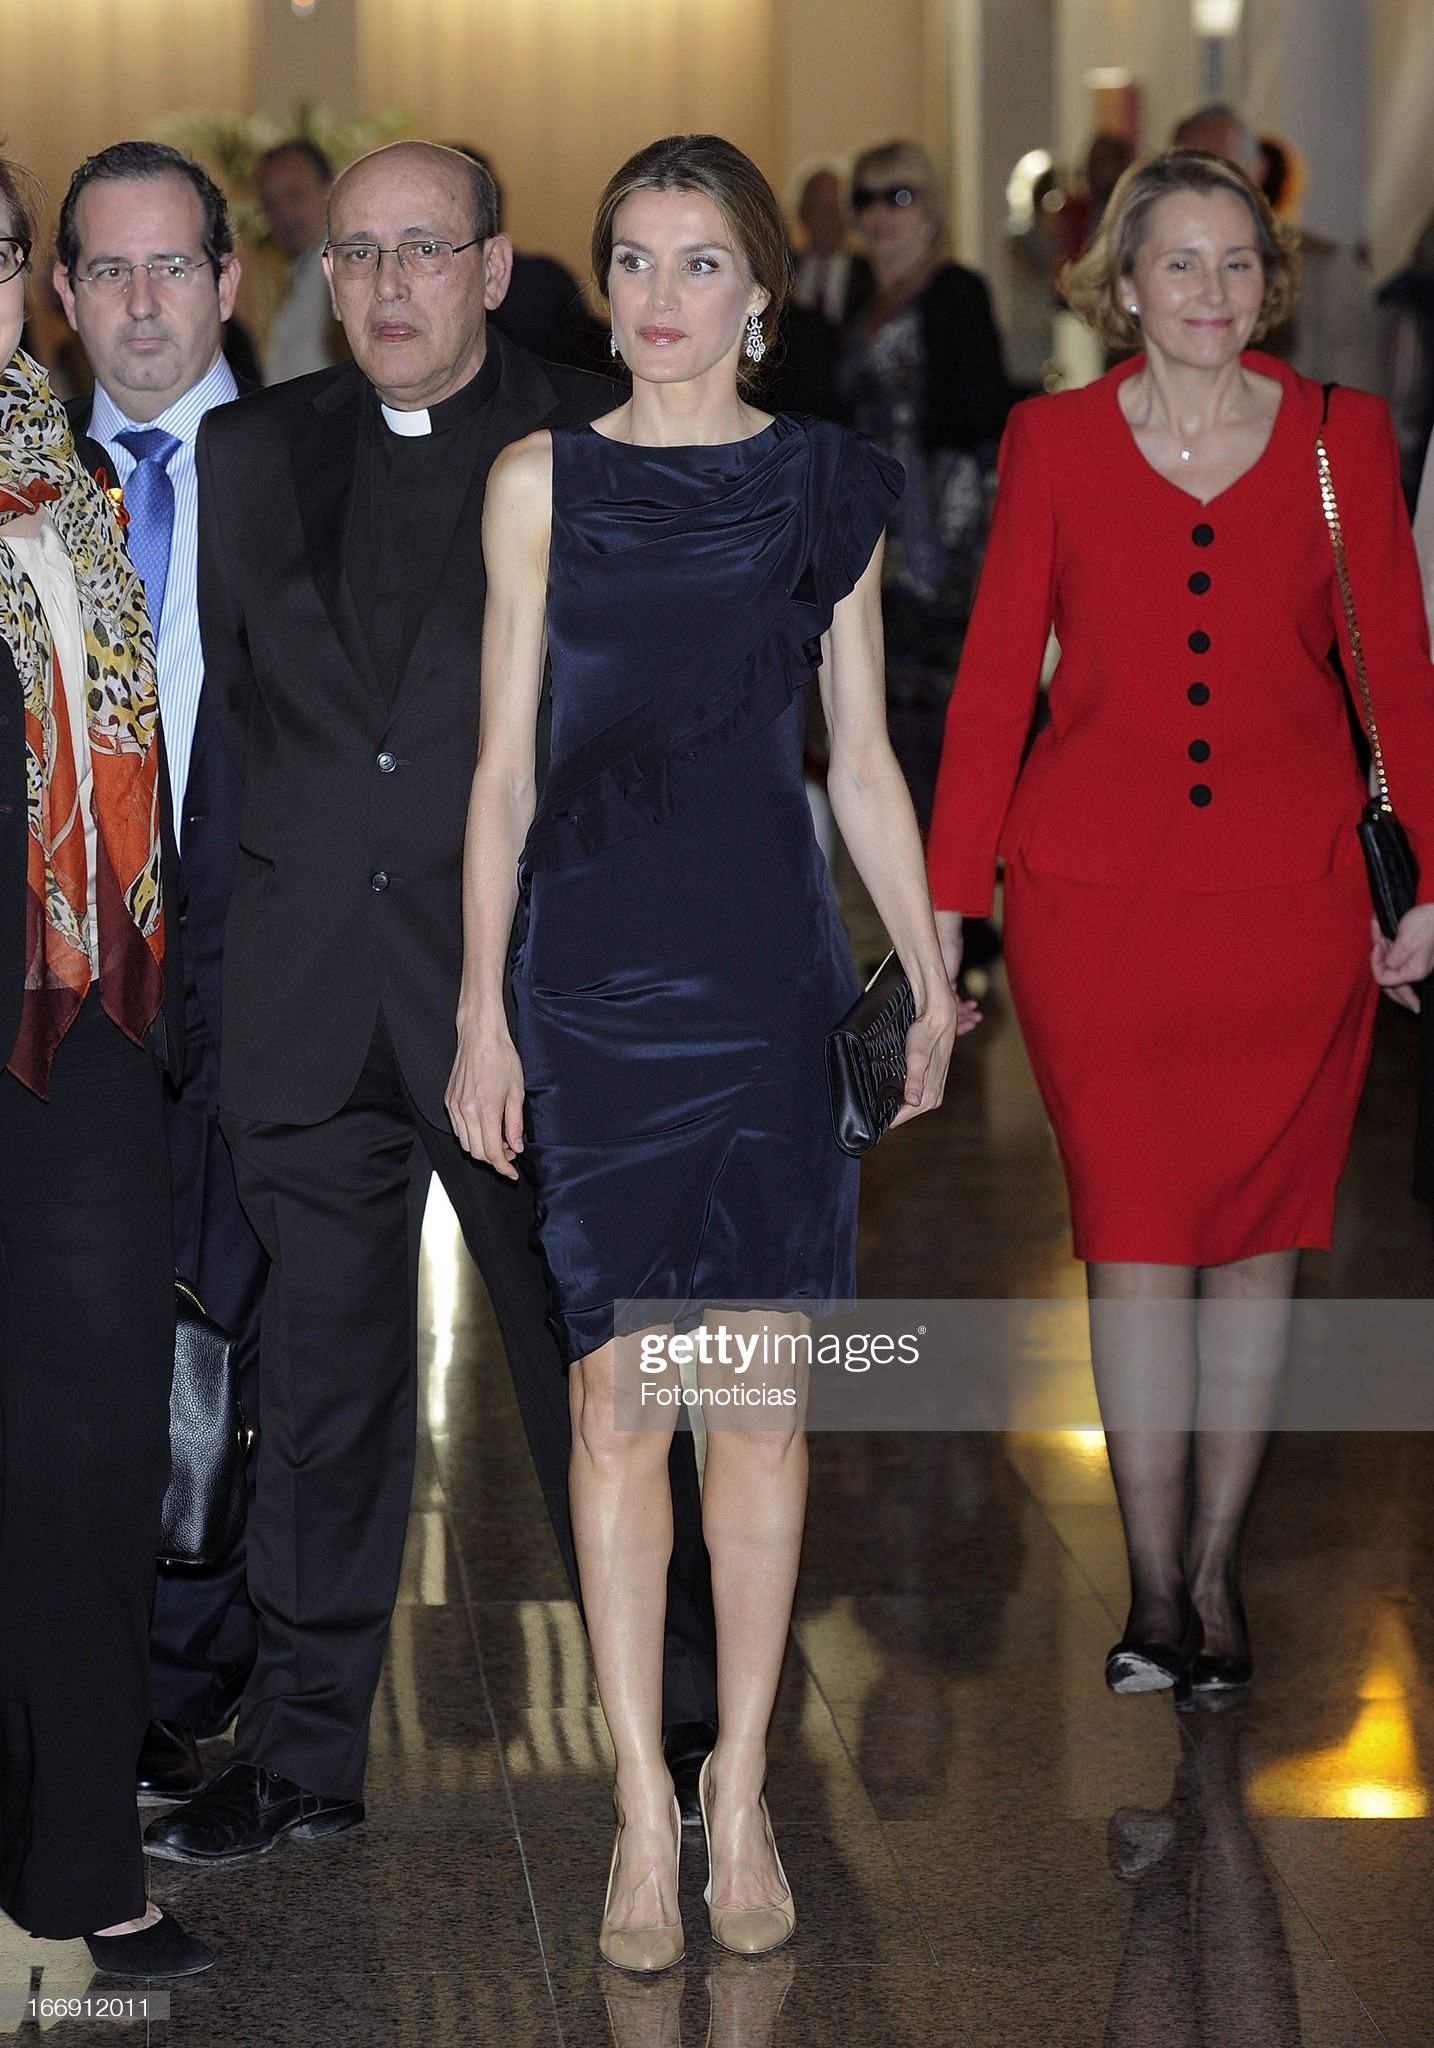 Вечерние наряды Королевы Летиции Princess Letizia Attends a Concert At The Auditorio Nacional de Musica : News Photo